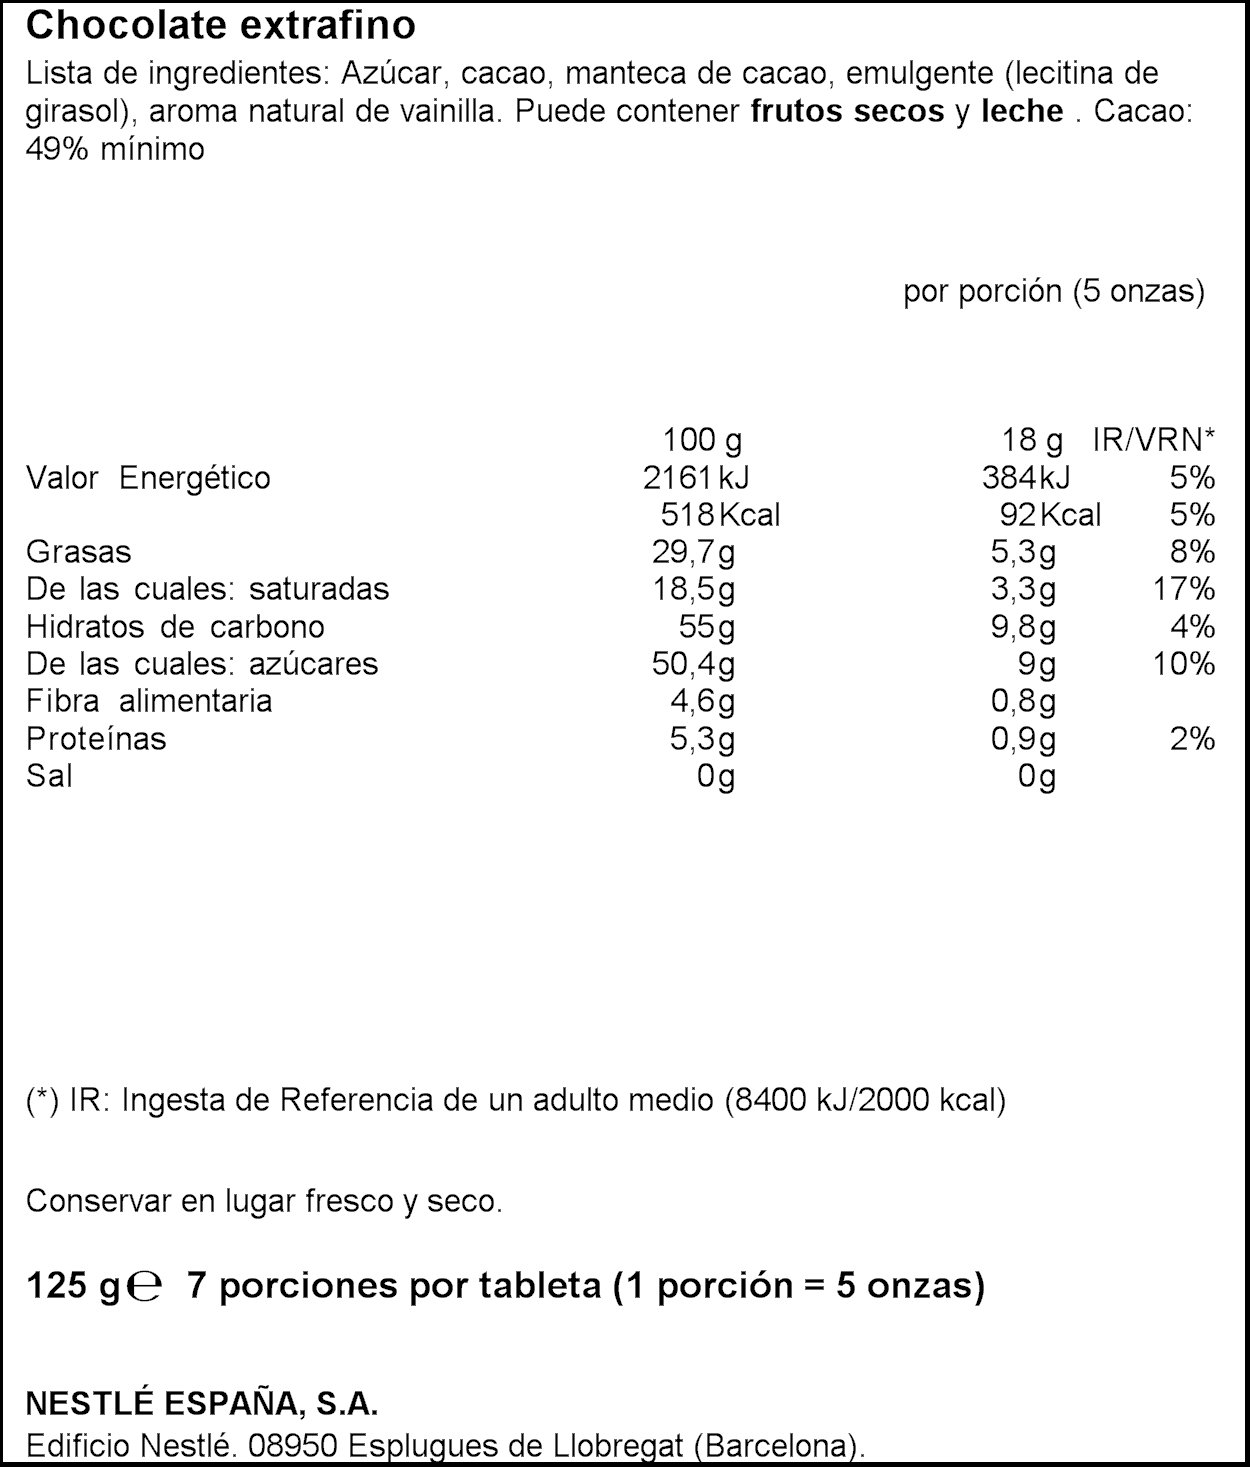 Nestlé Extrafino Tableta de Chocolate Negro - 125 g: Amazon.es: Amazon Pantry